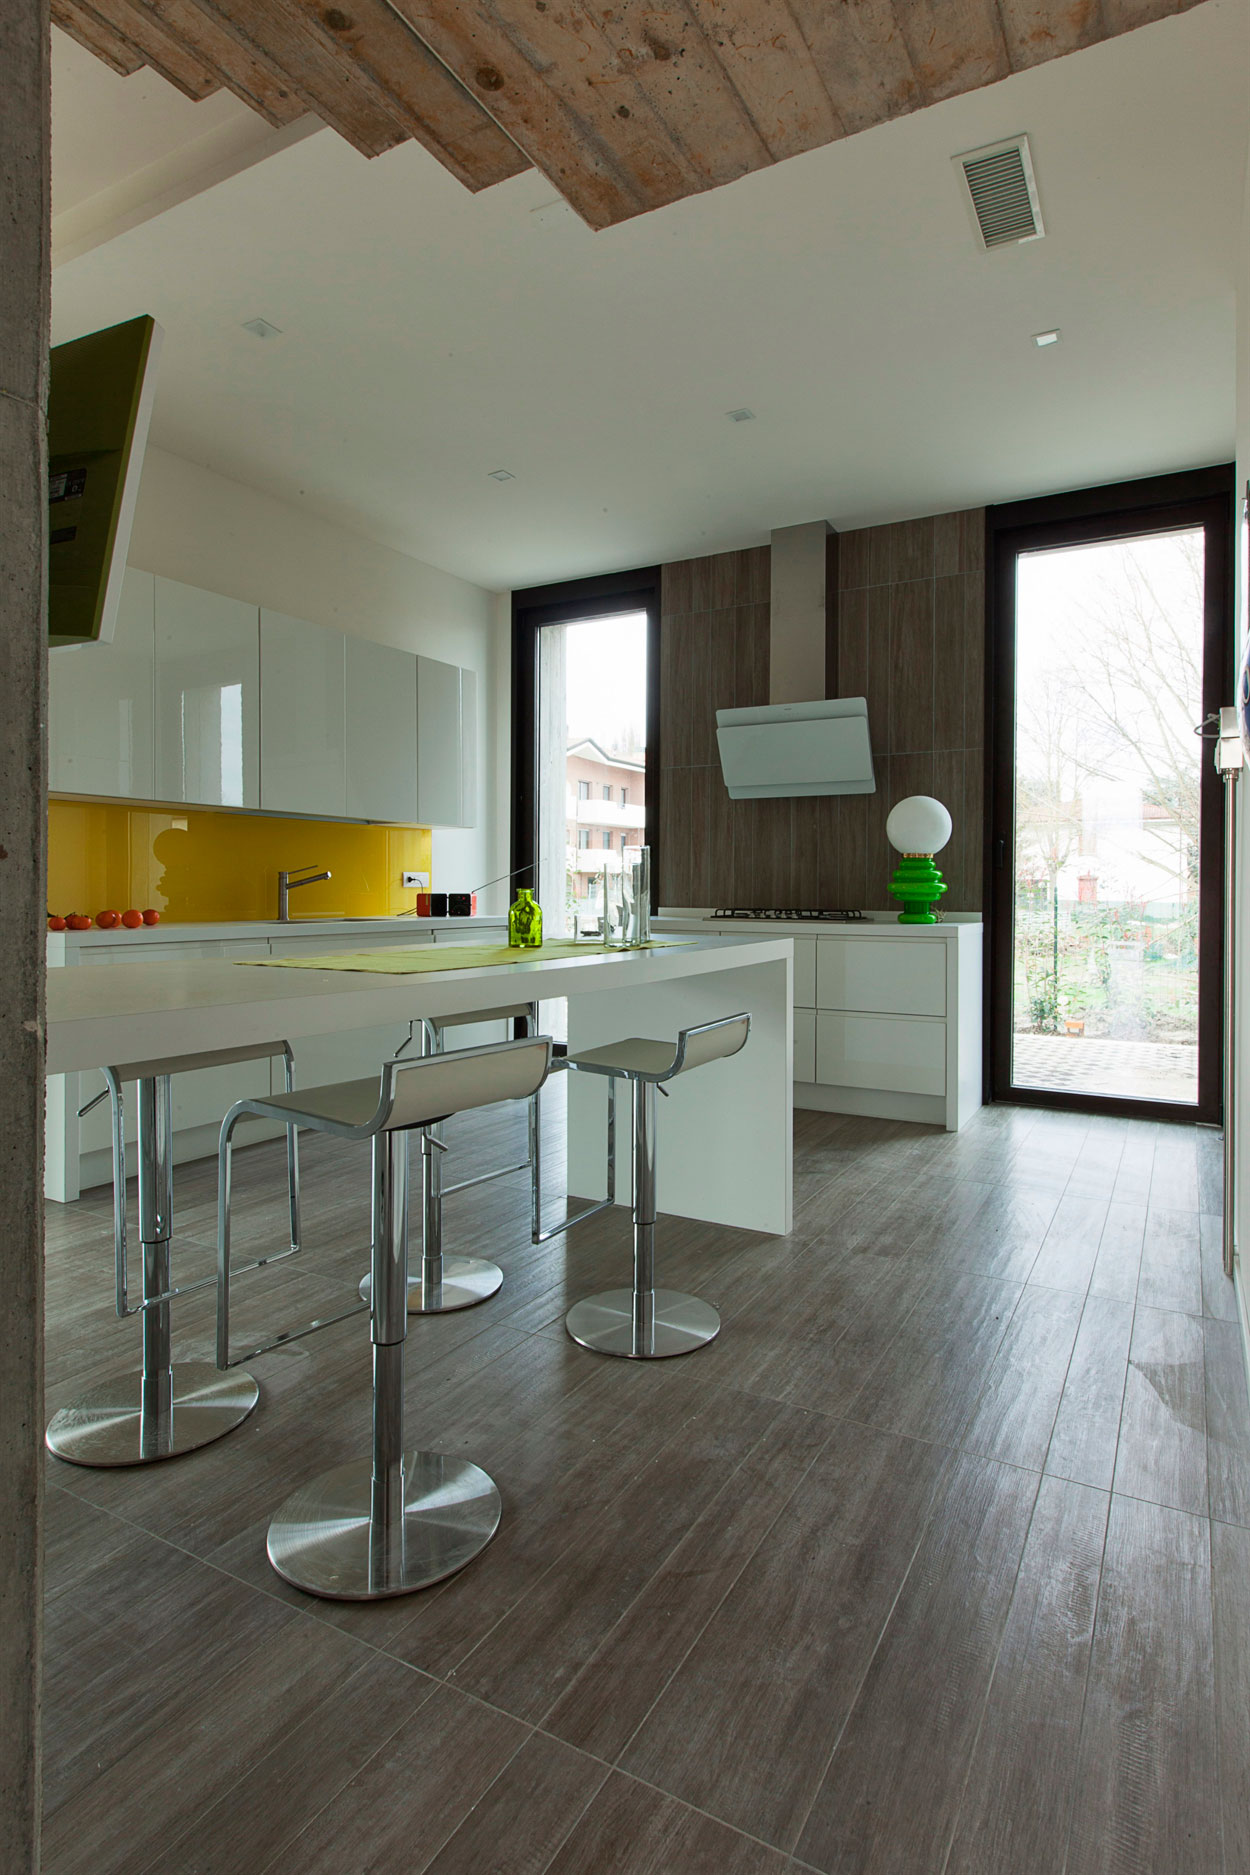 D'Autore Residence near Bologna by Giraldi Associati Architetti-20